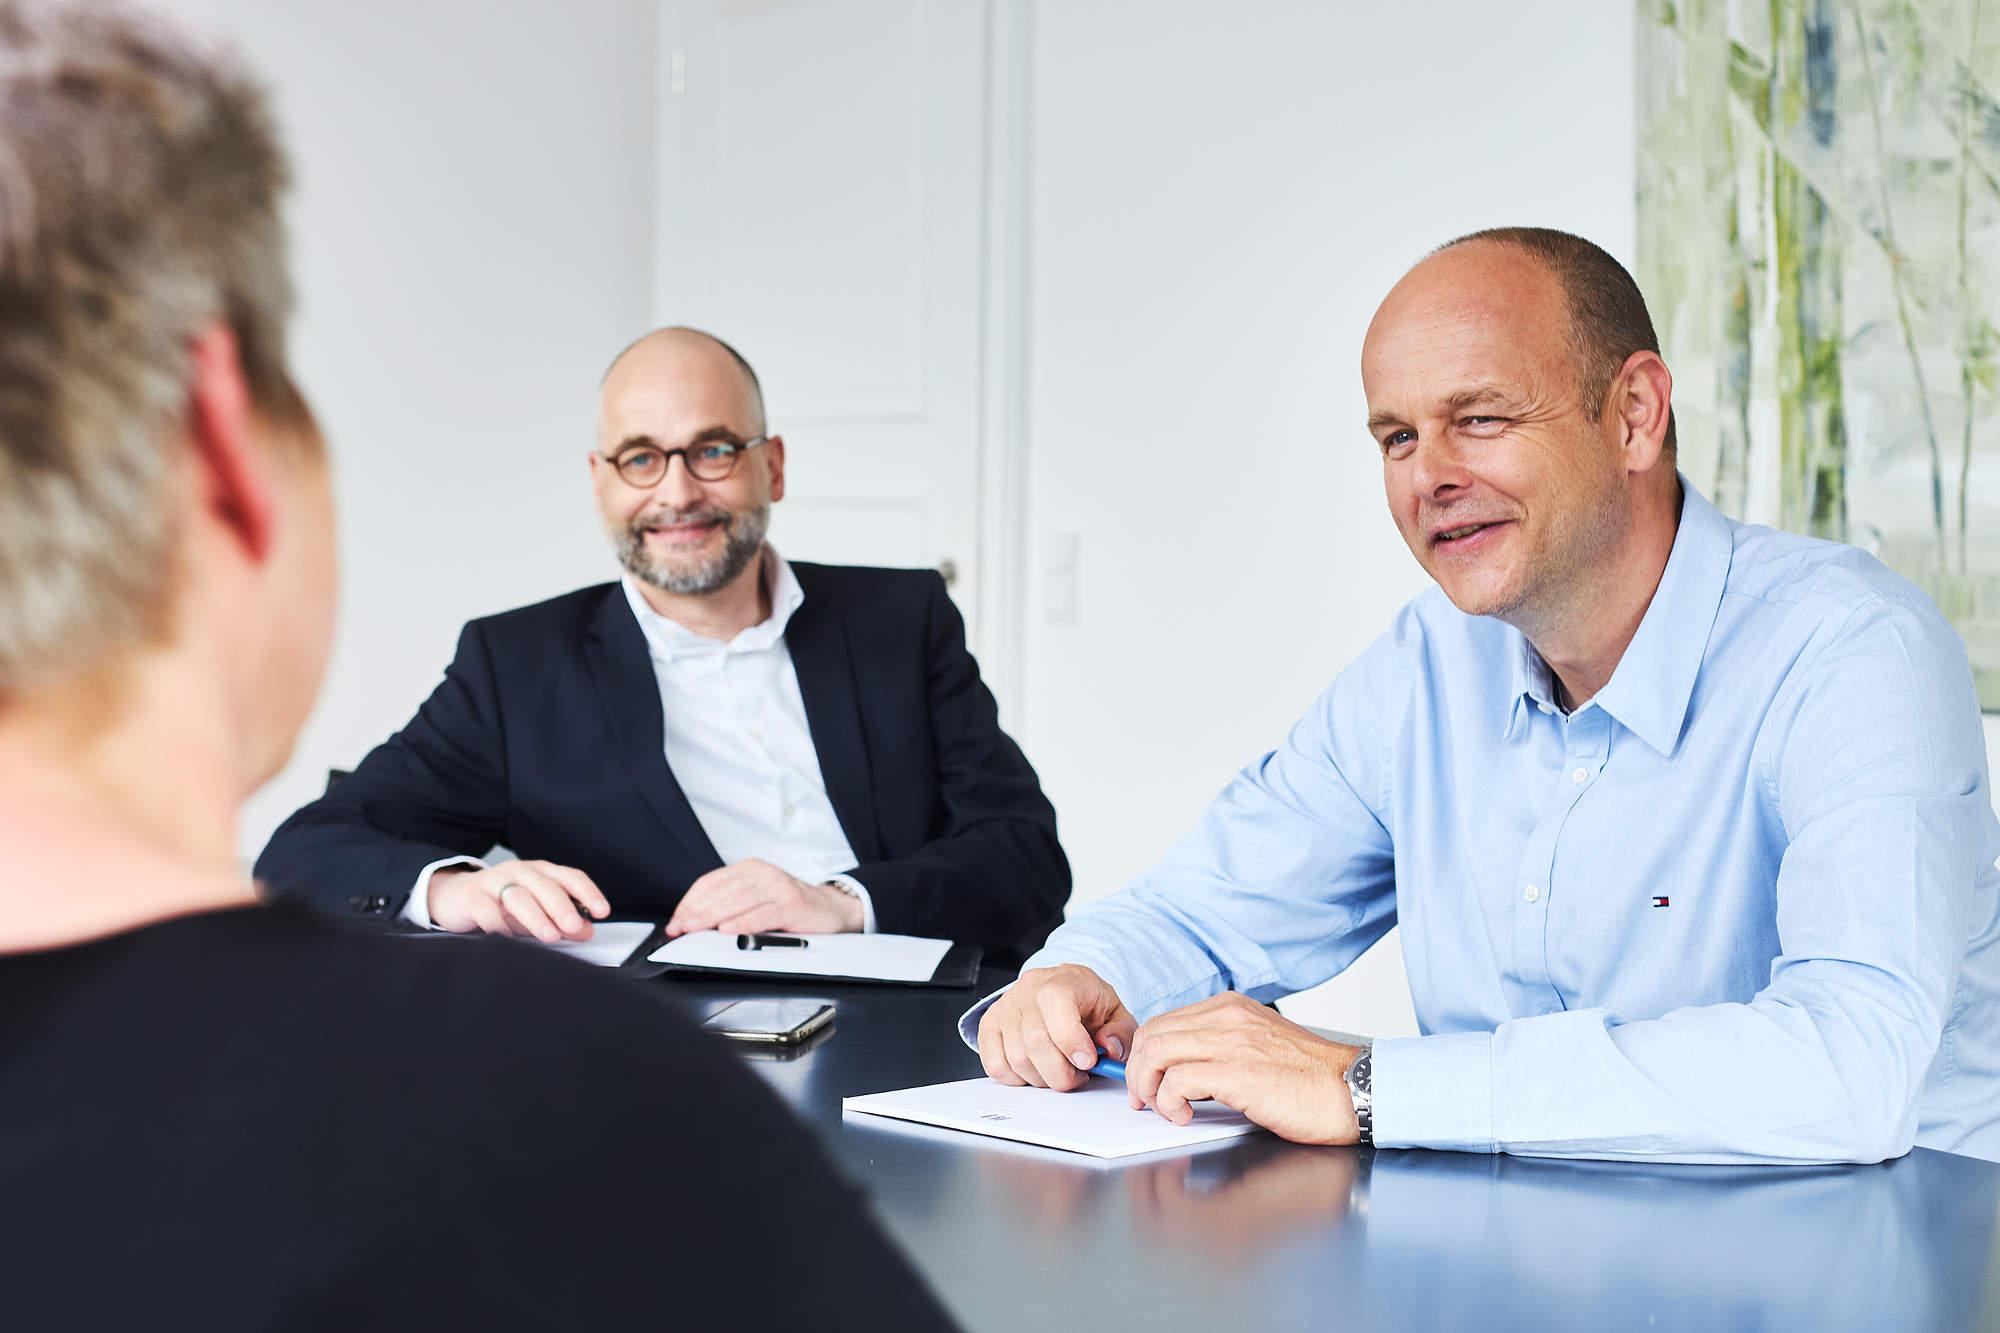 Mandantengespräch über Aufhebungsvertrag Arbeitsrecht, in der Kanzlei der Rechtsanwälte Aachen